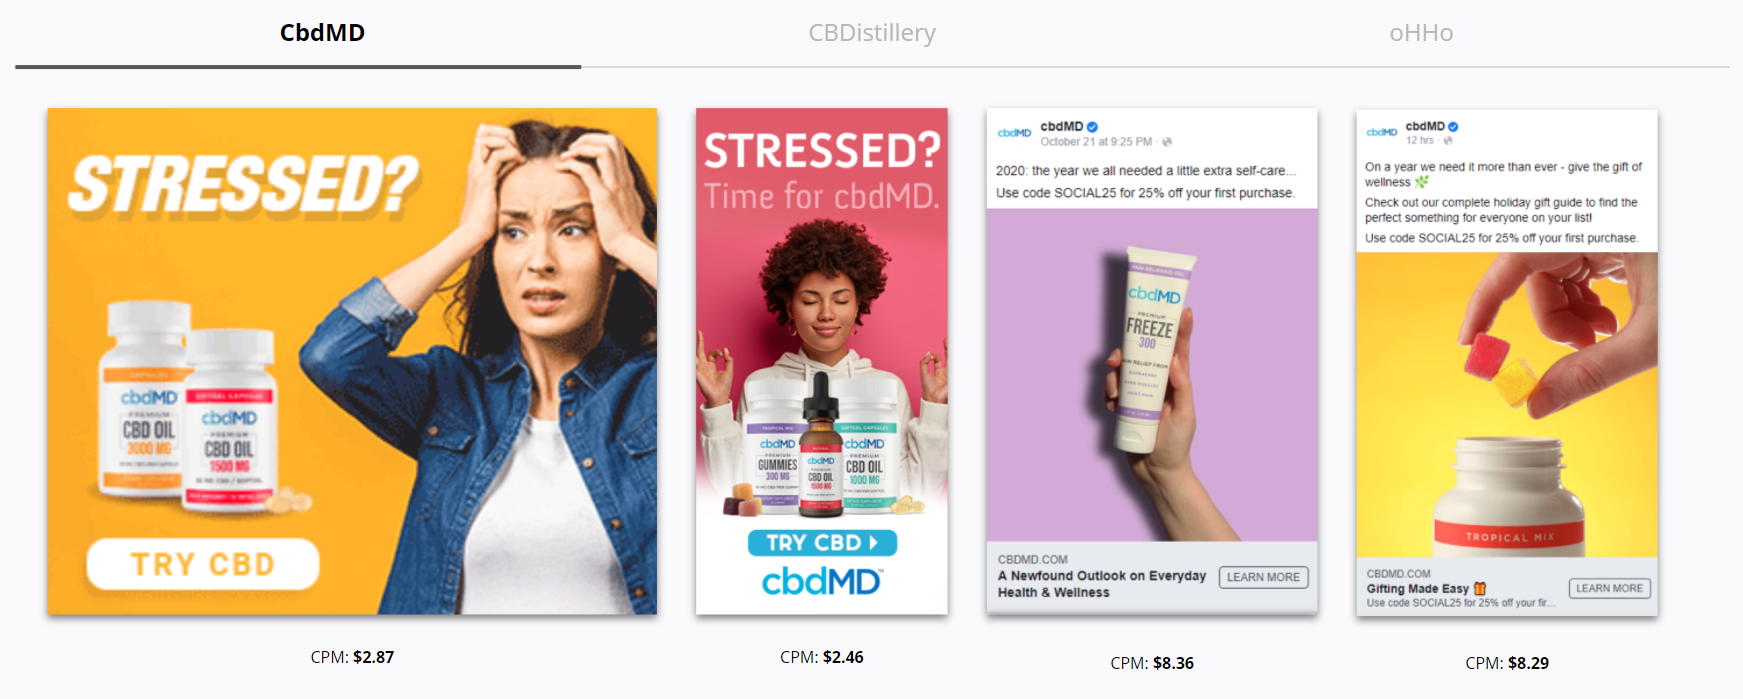 CbdMD - Stress Relief